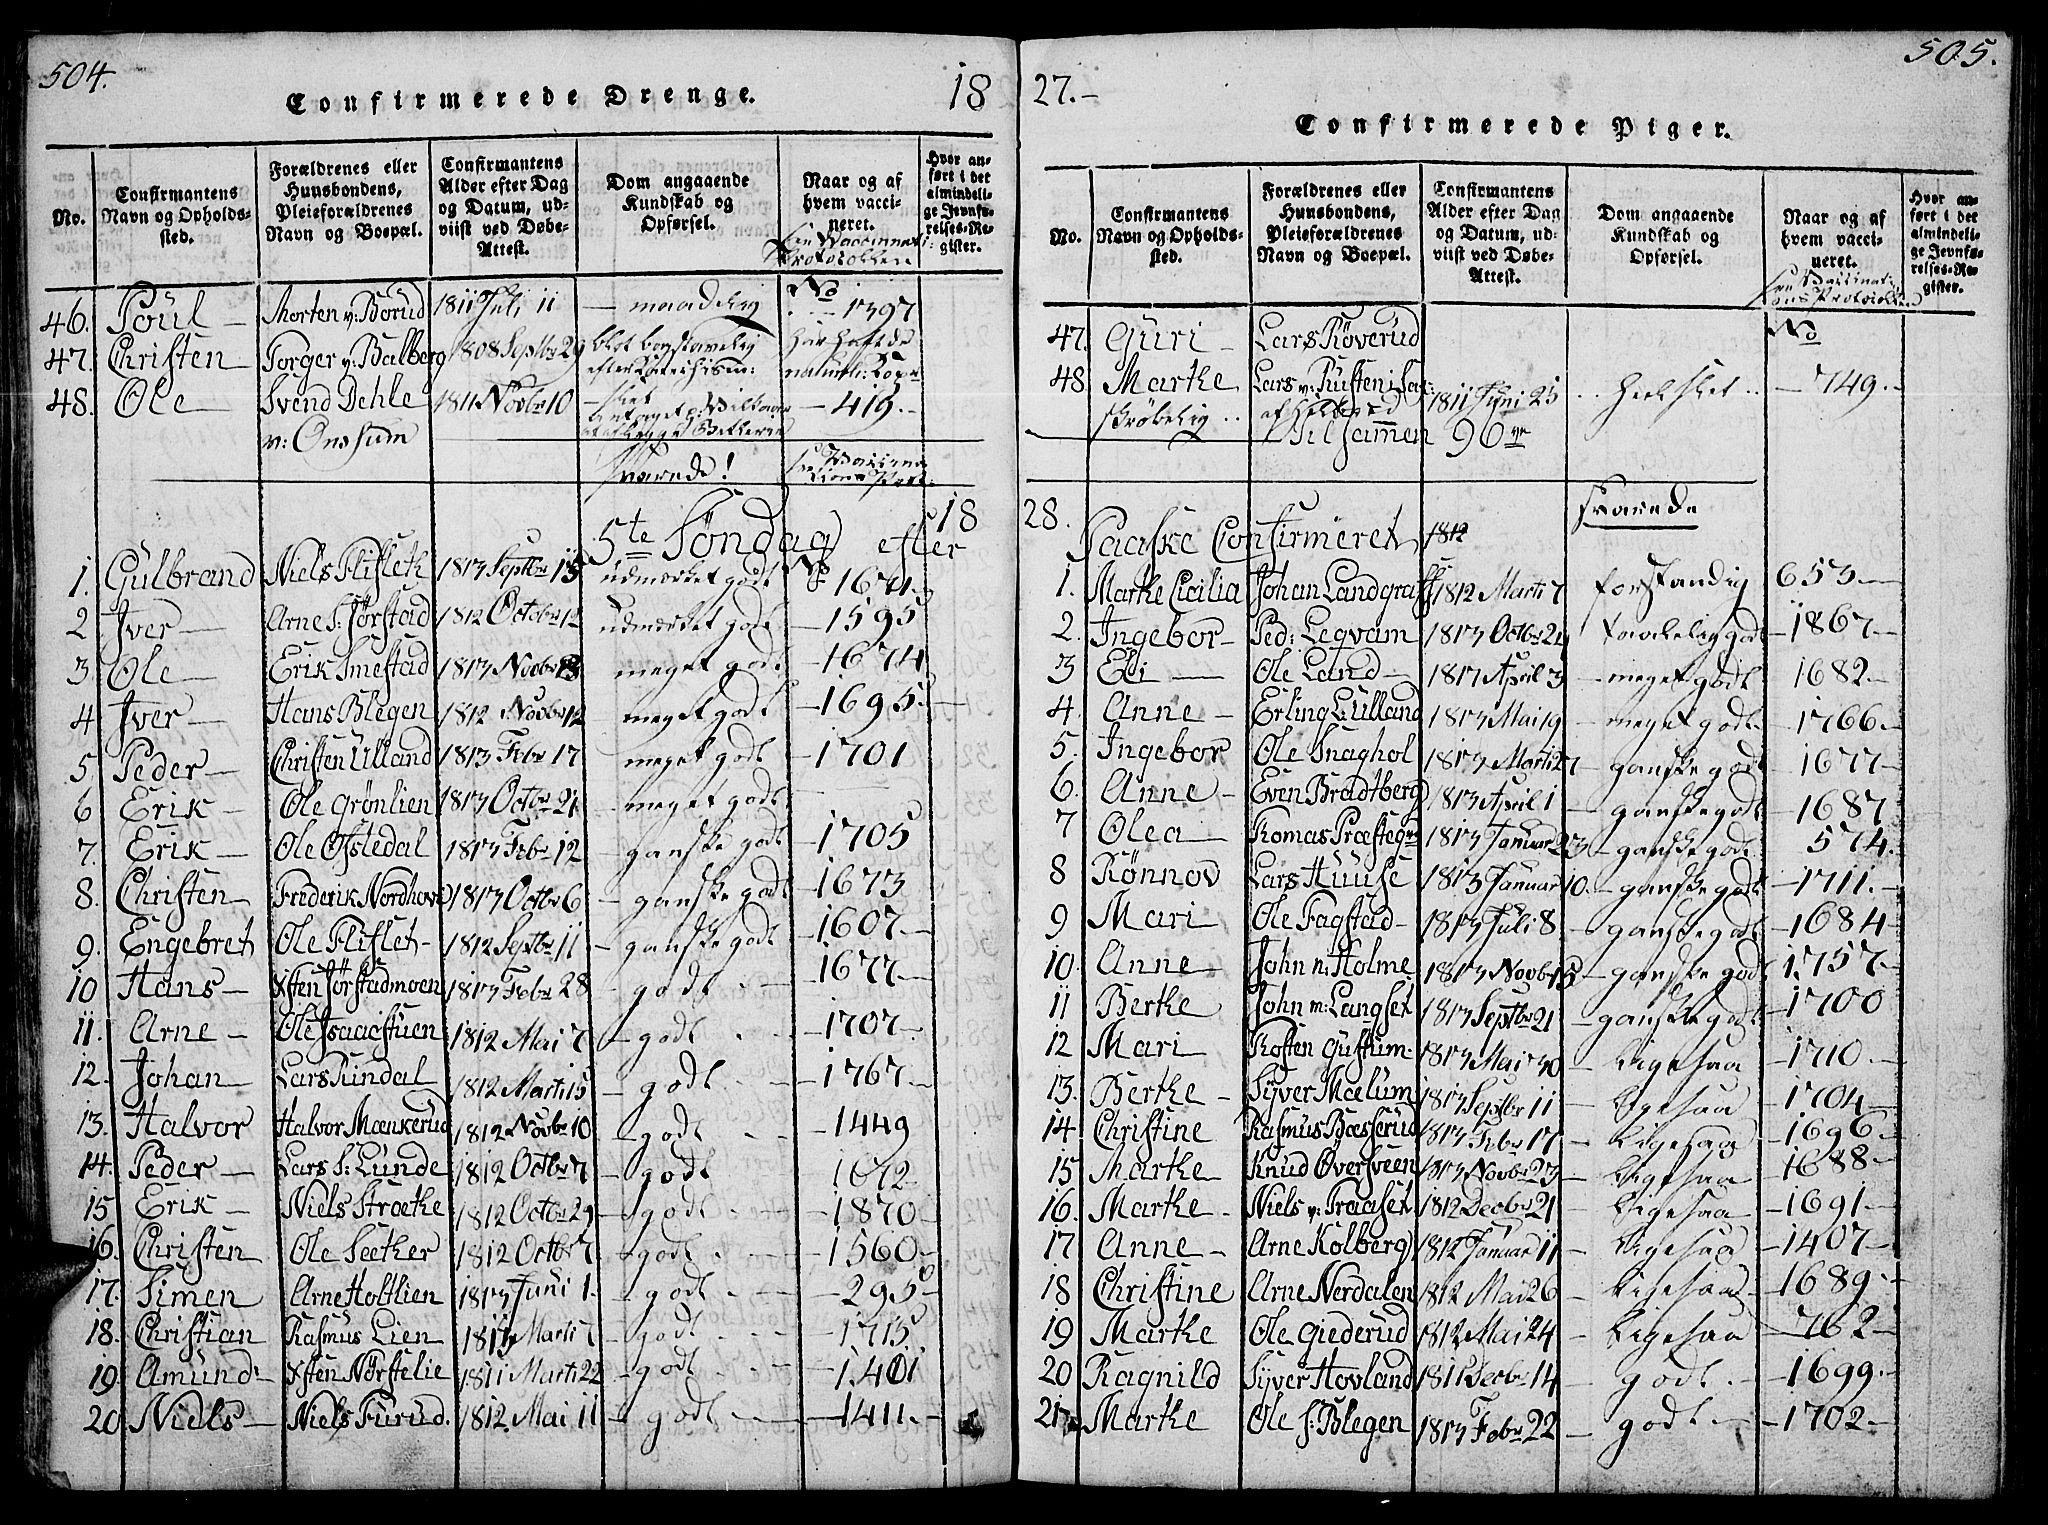 SAH, Fåberg prestekontor, Klokkerbok nr. 4, 1818-1837, s. 504-505